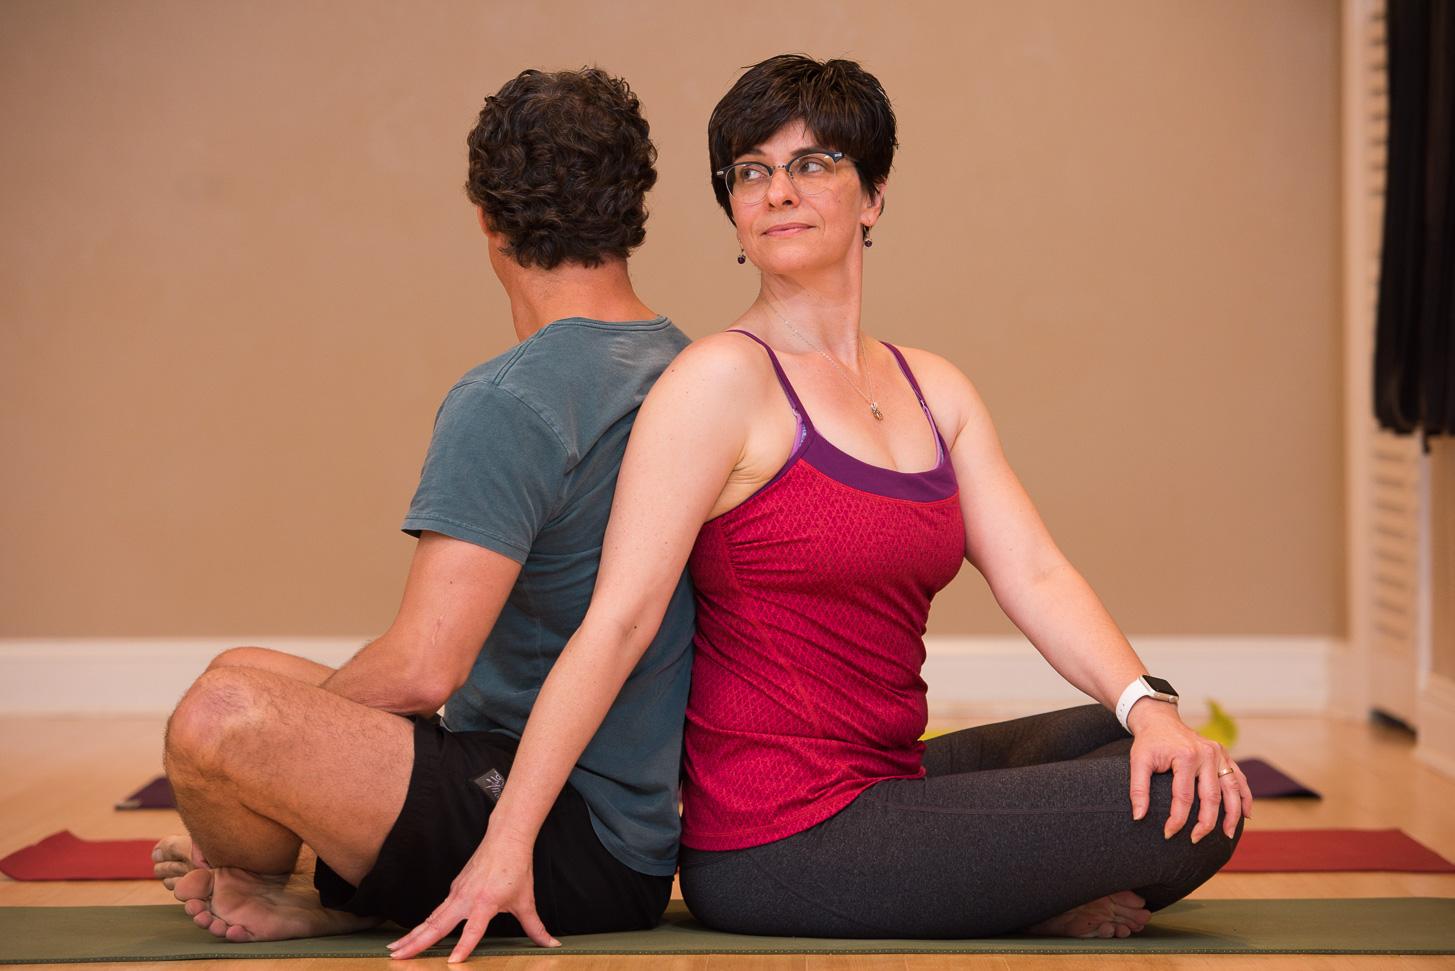 Study yoga at home